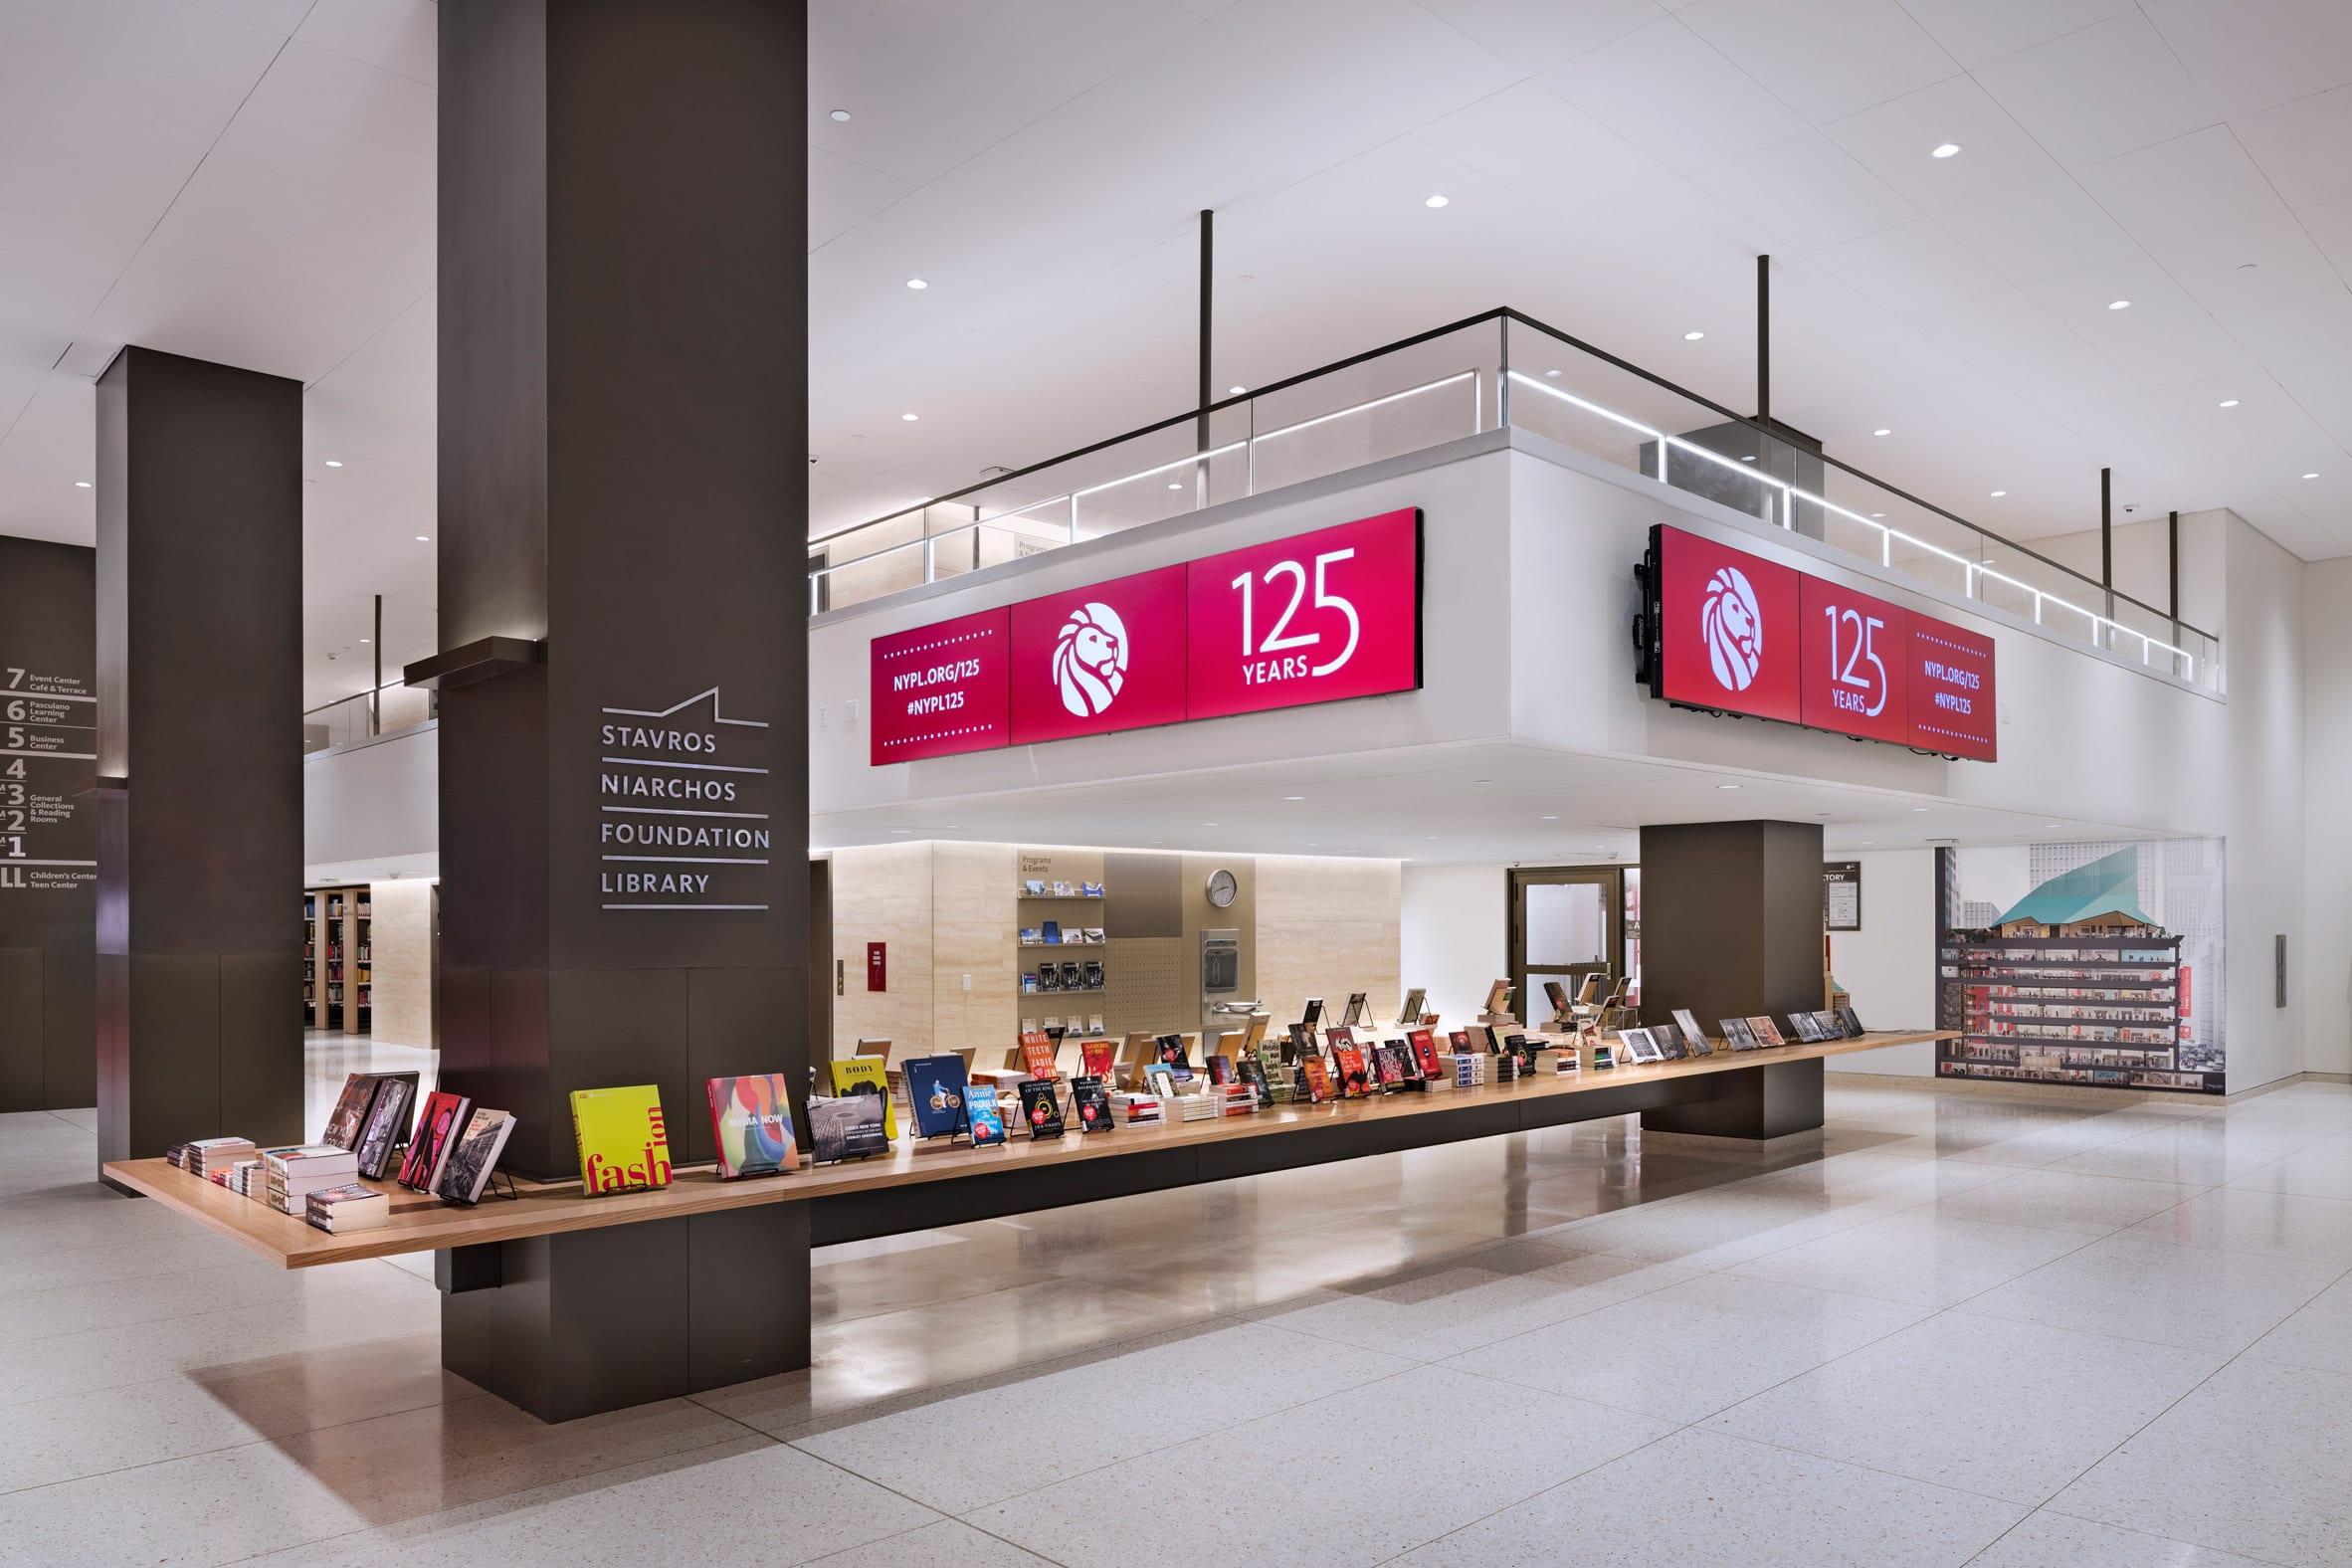 New York library renovation by Mecanoo